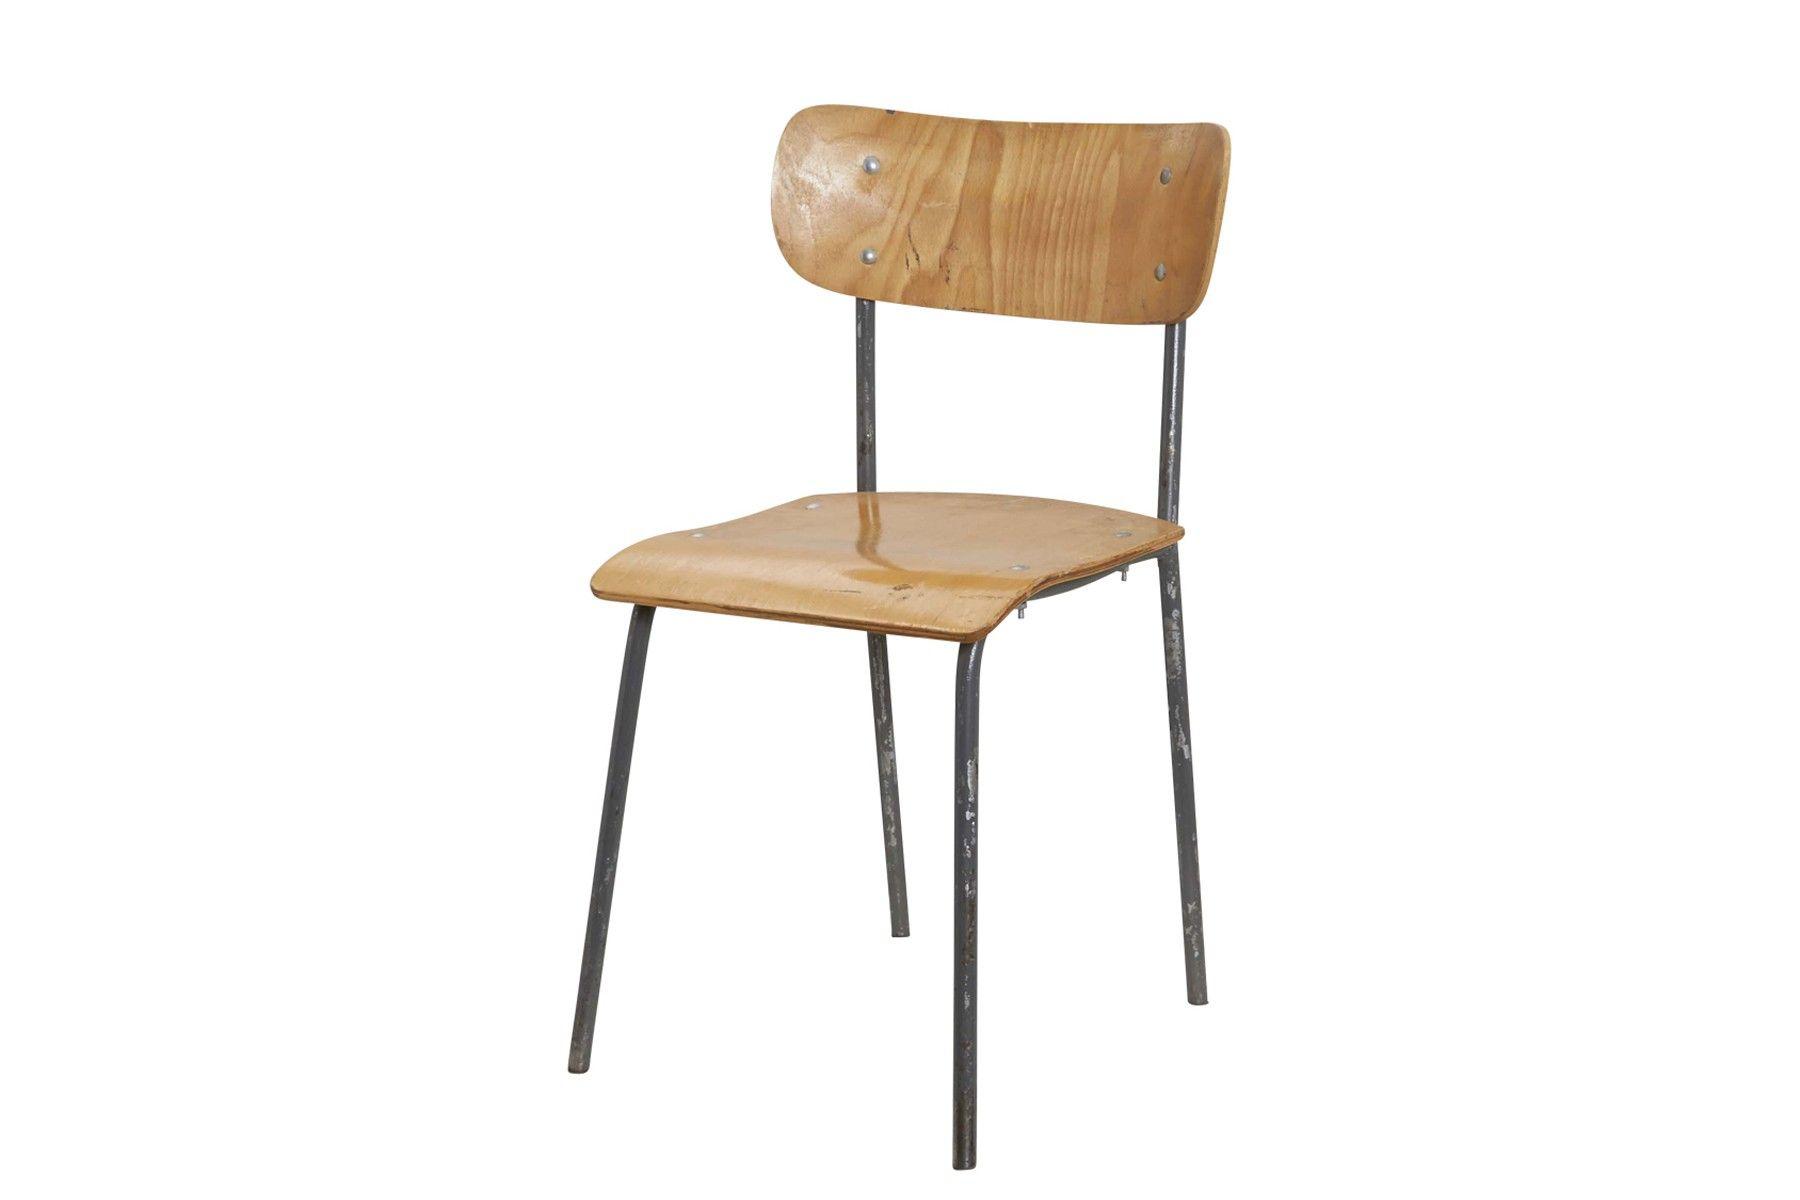 Stoel Sissy Boy : Schoolstoel vintage stoel meubilair homeland u au a sissy boy